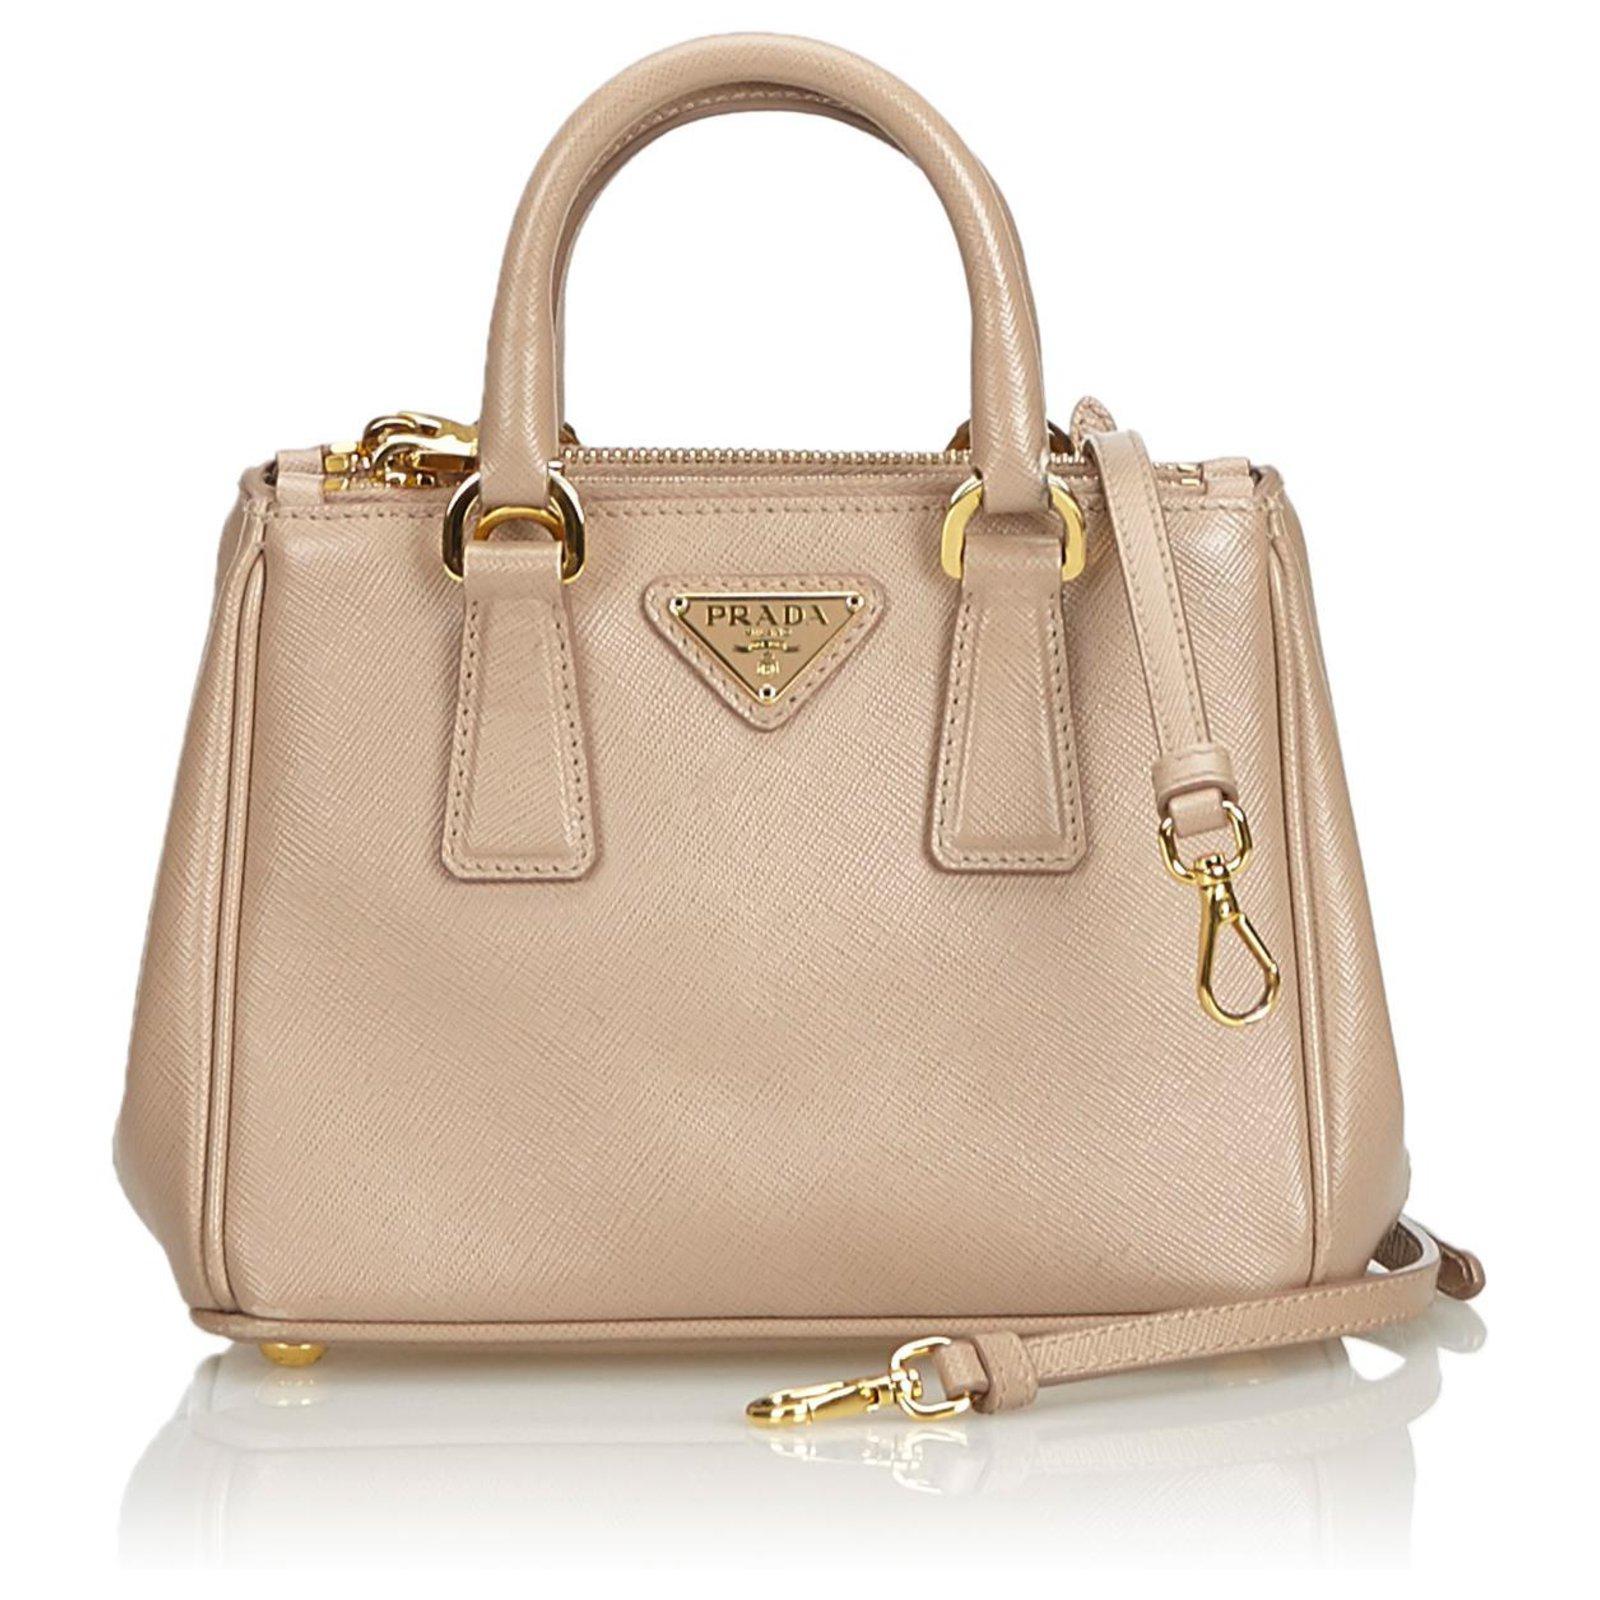 3b9b32cb64e4 Prada Prada Brown Saffiano Galleria Satchel Handbags Leather,Other Brown  ref.128036